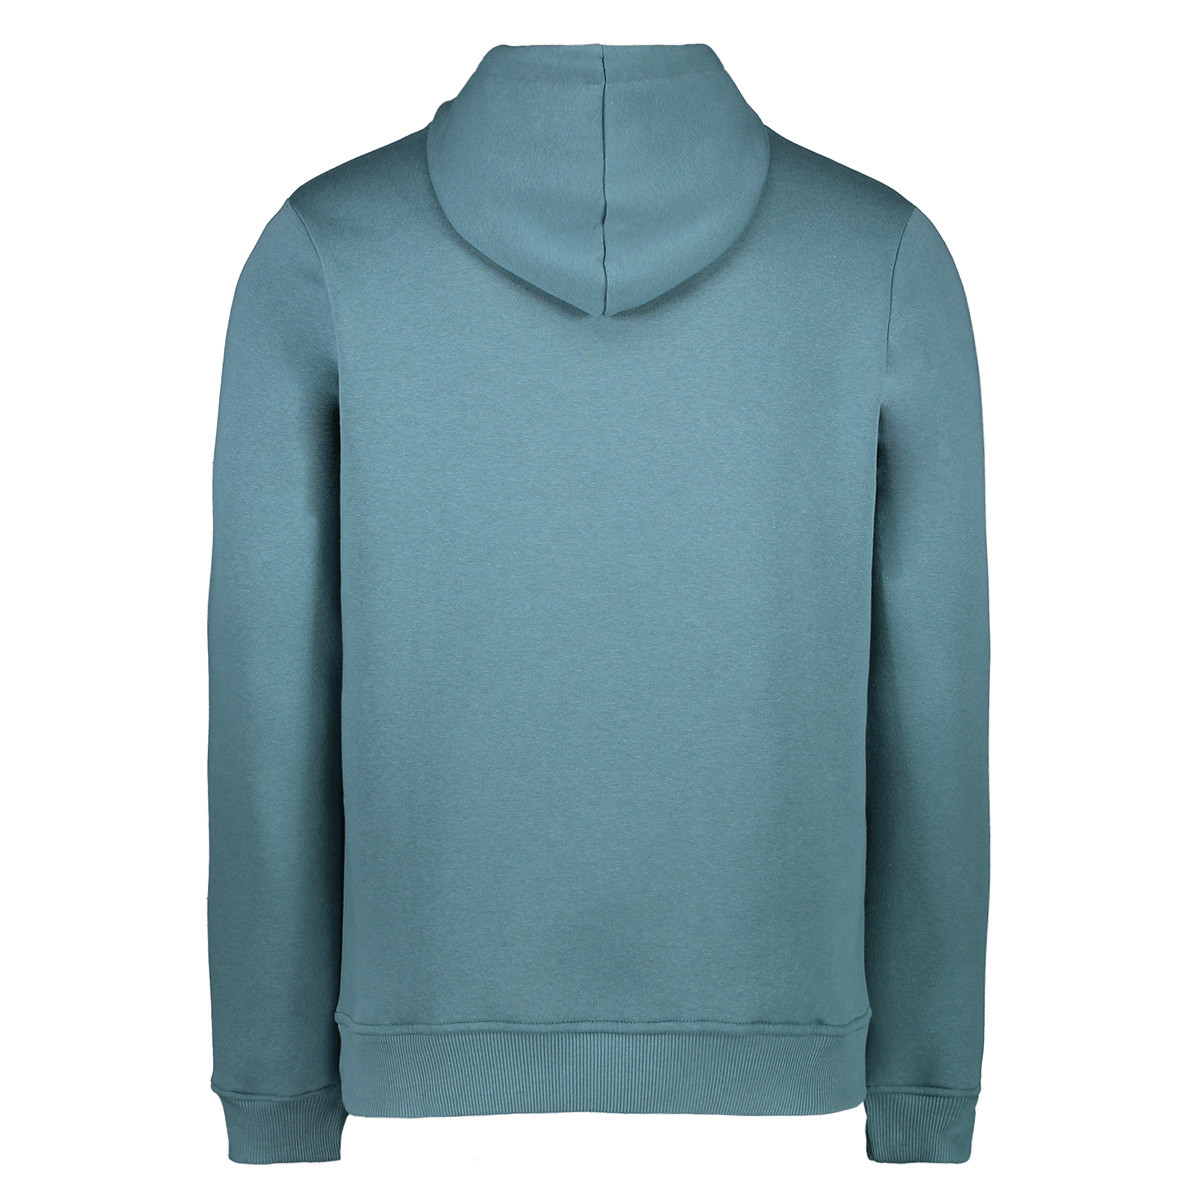 kimar hood sw 40379 cars sweater 54 sea green